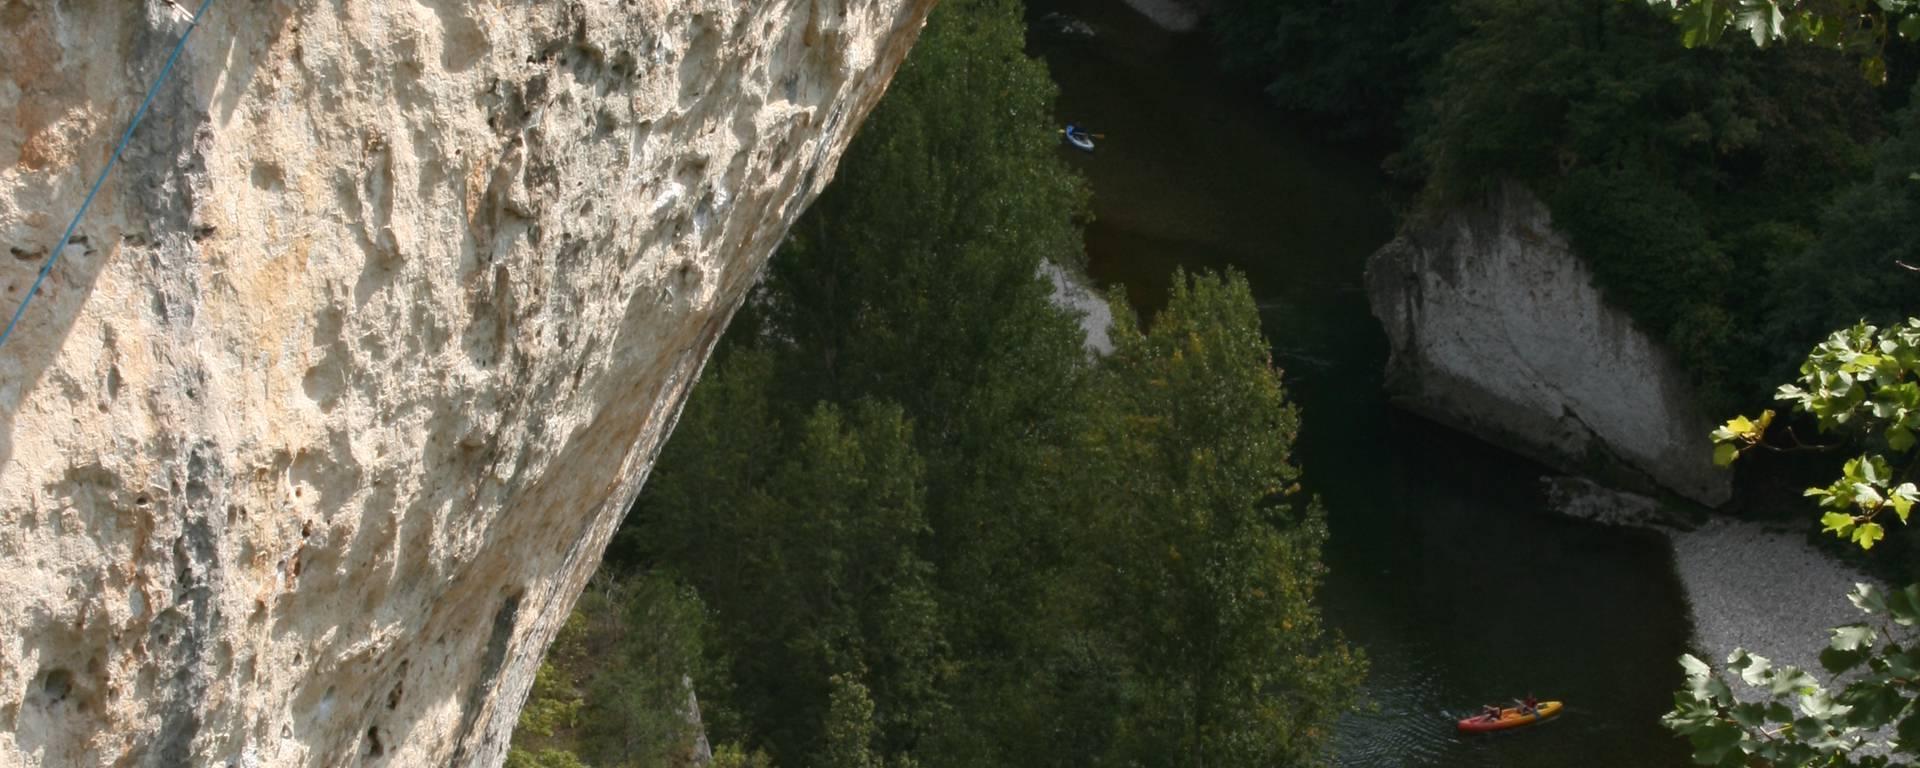 The Baumes circus, a popular climbing spot